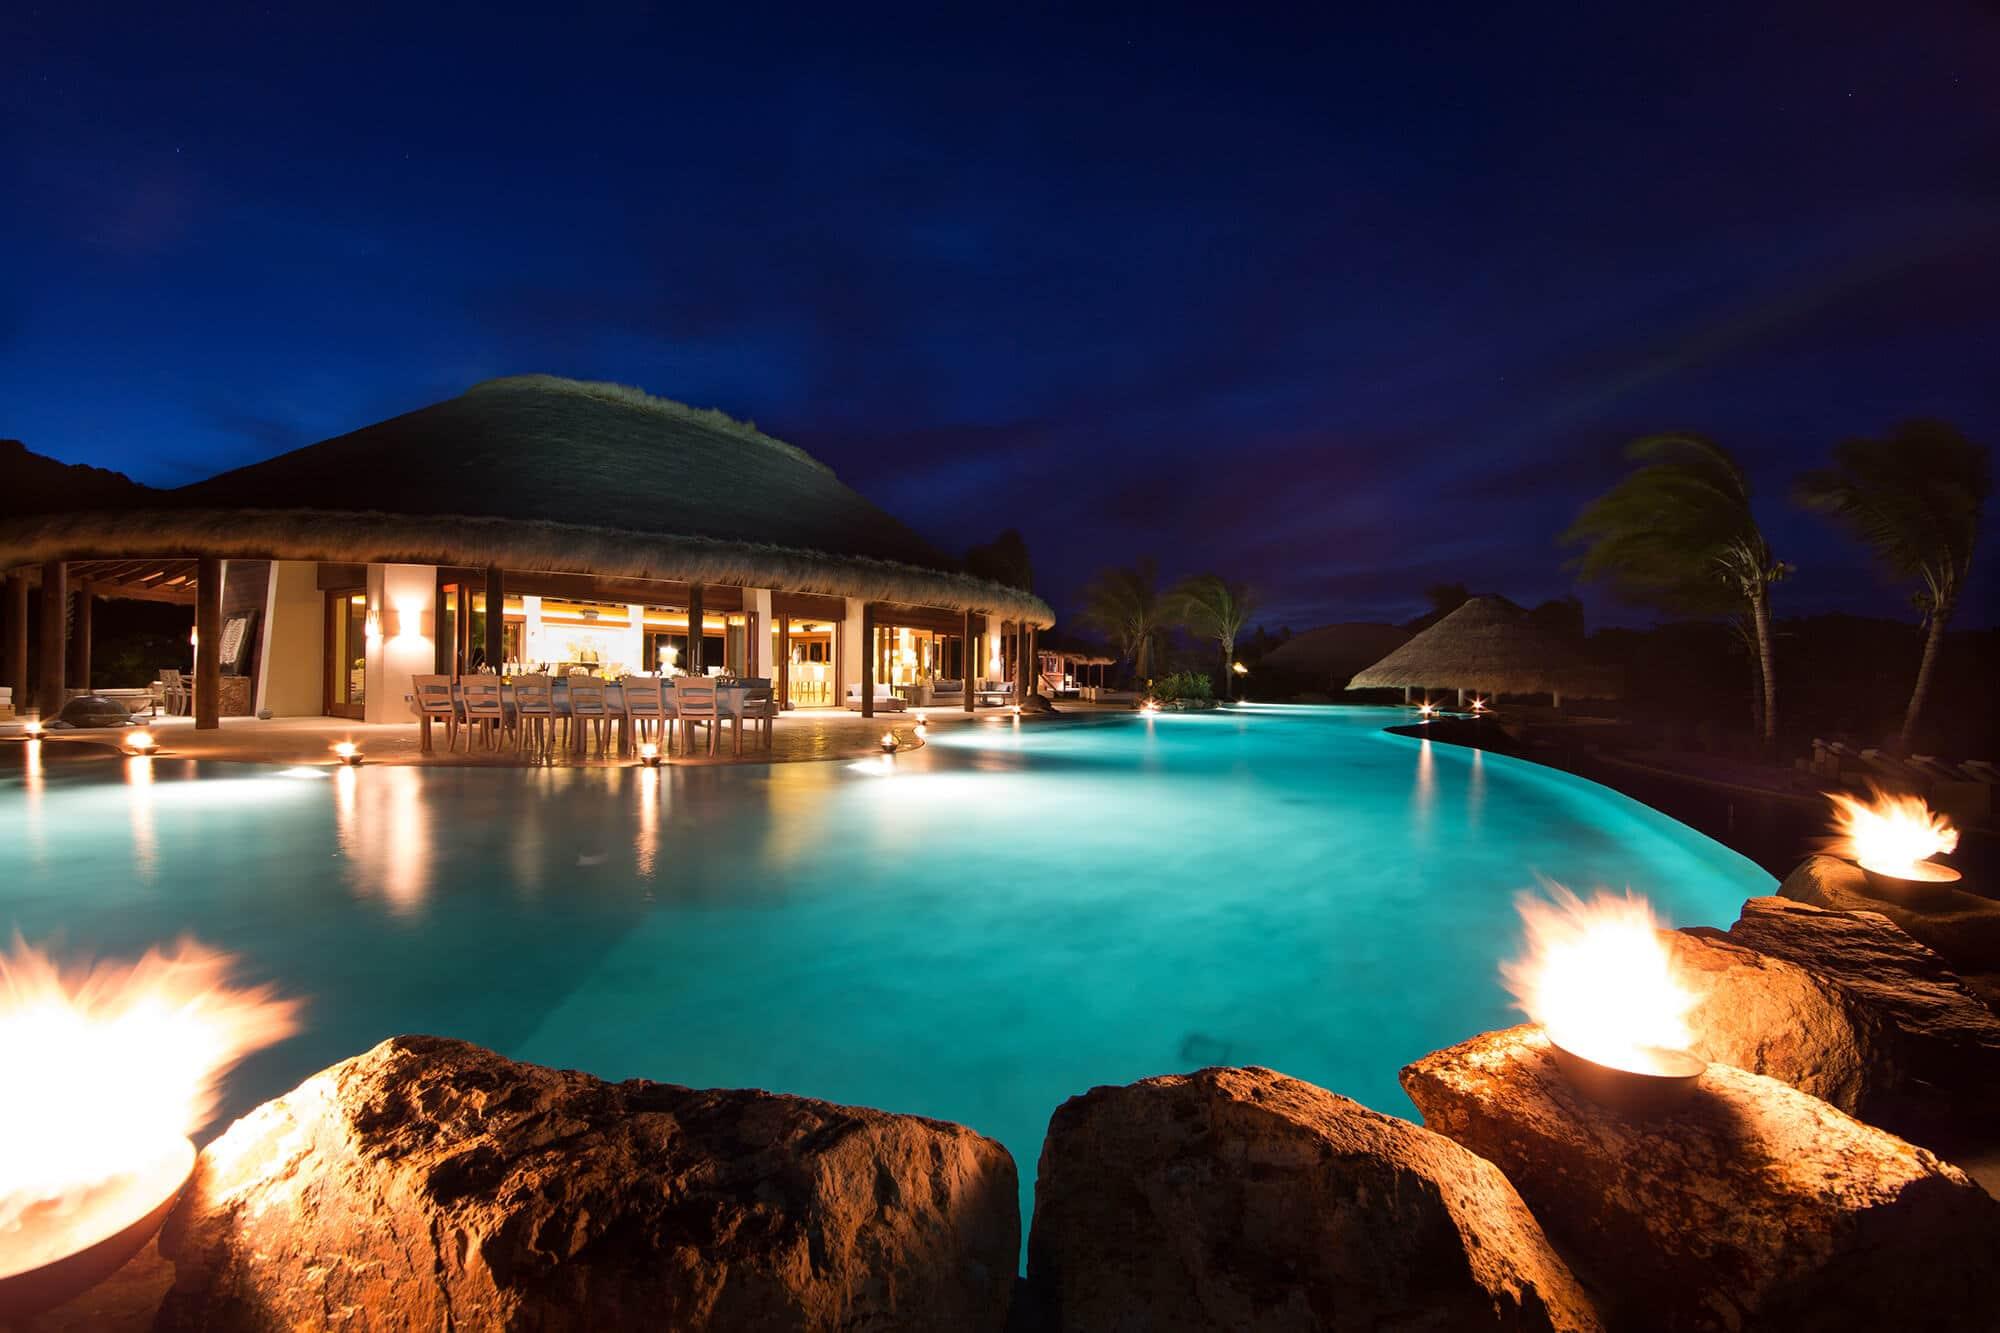 Moskito Island by Richard Branson und Virgin Limited Edition